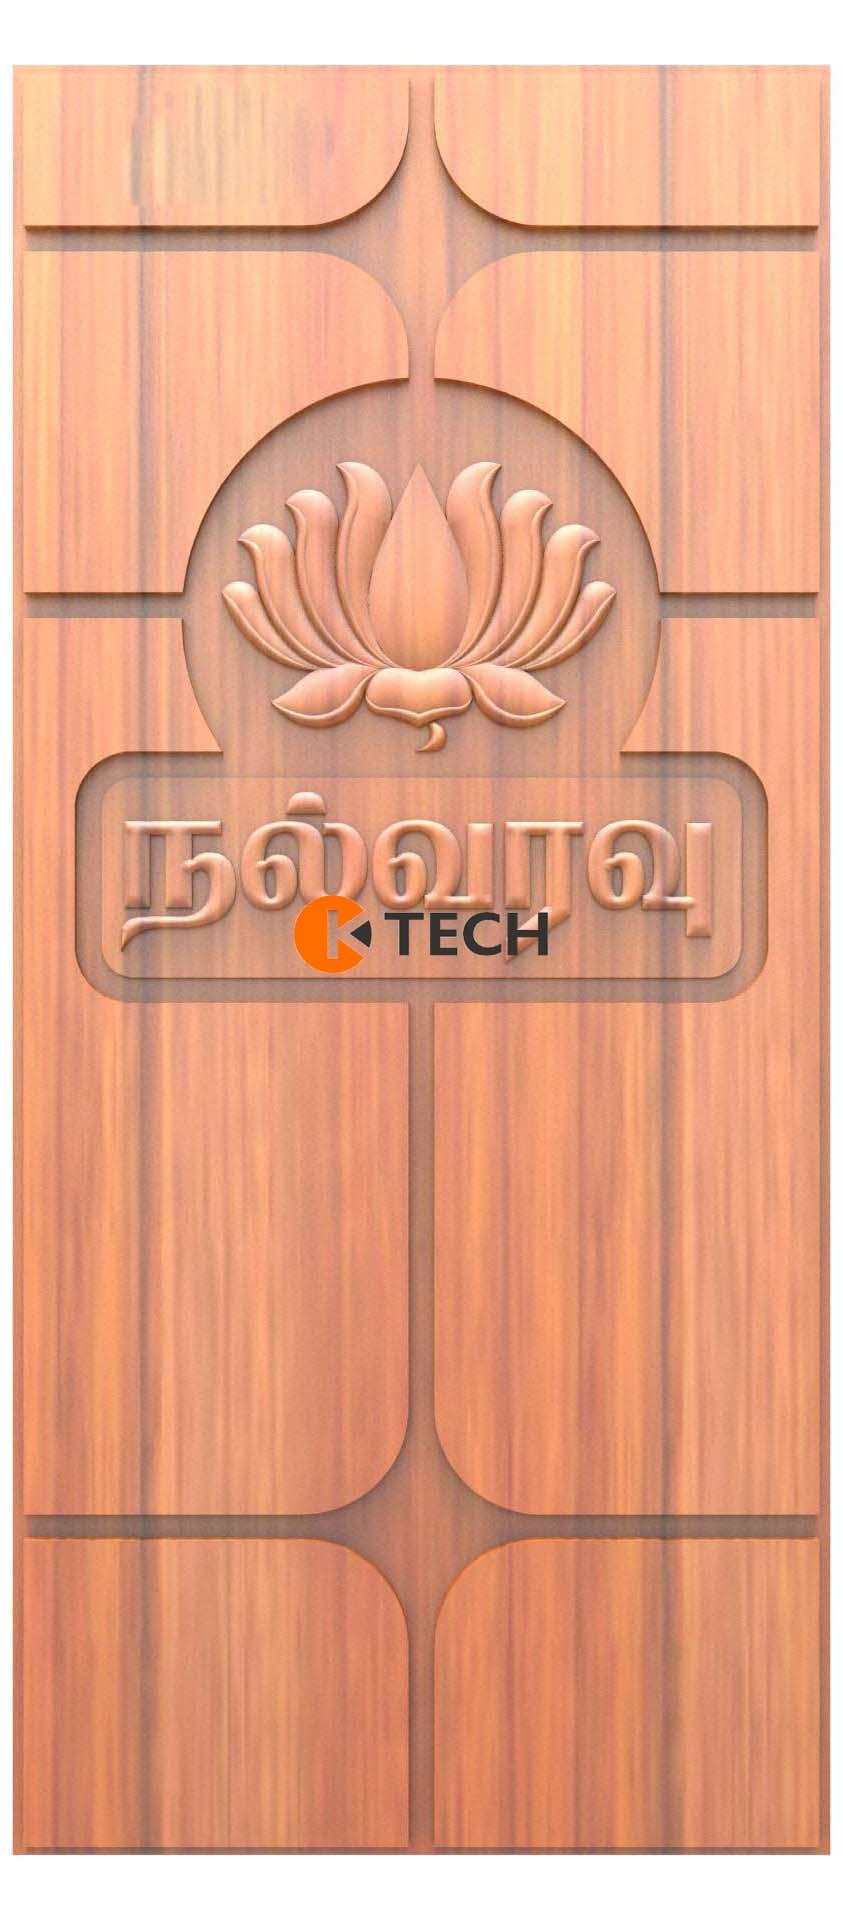 K-TECH CNC Doors Design 164